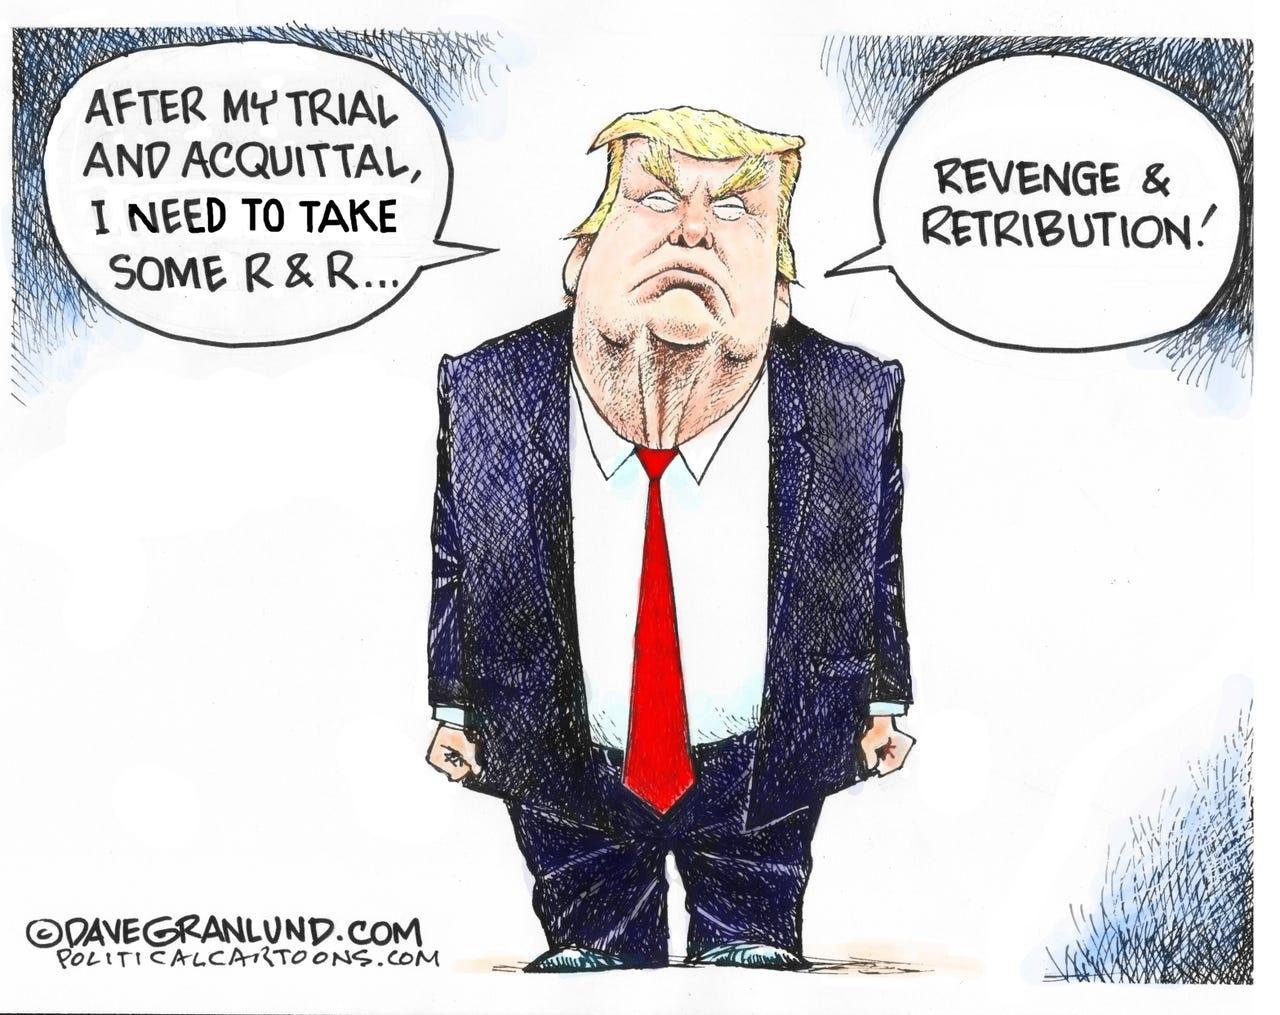 Feb. 13, 2020